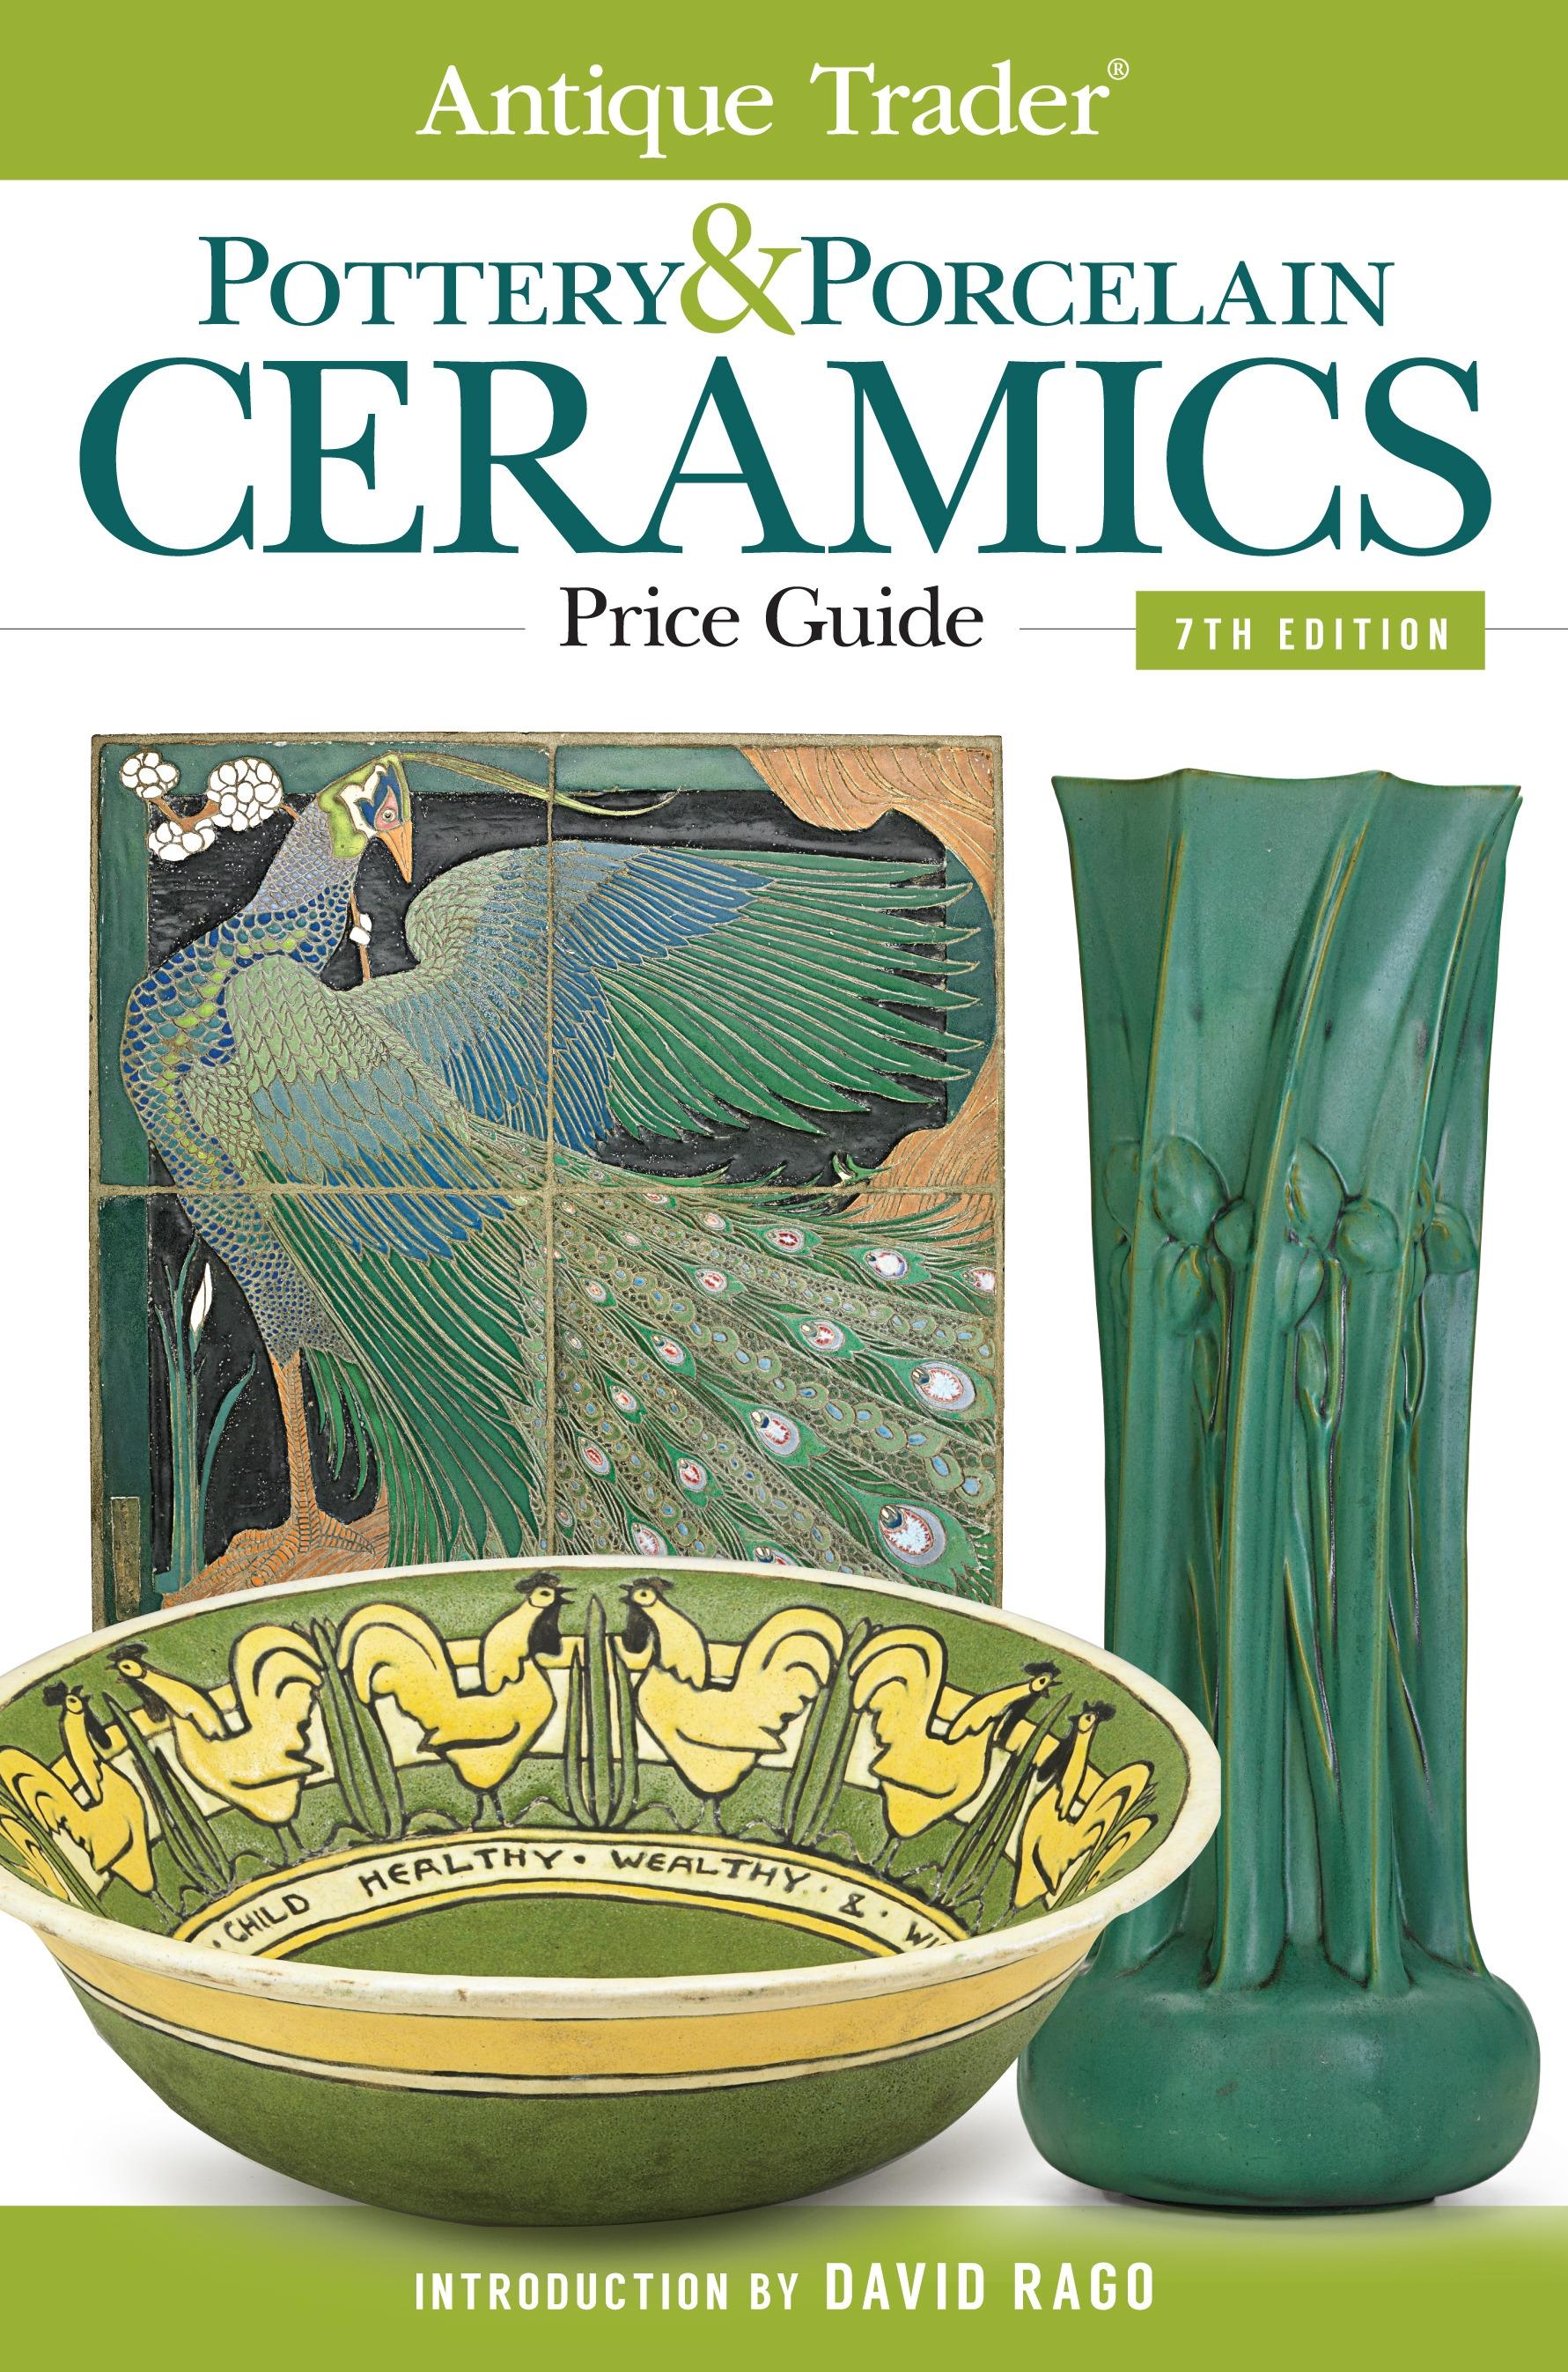 Antique Trader Pottery & Porcelain Ceramics Price Guide by David